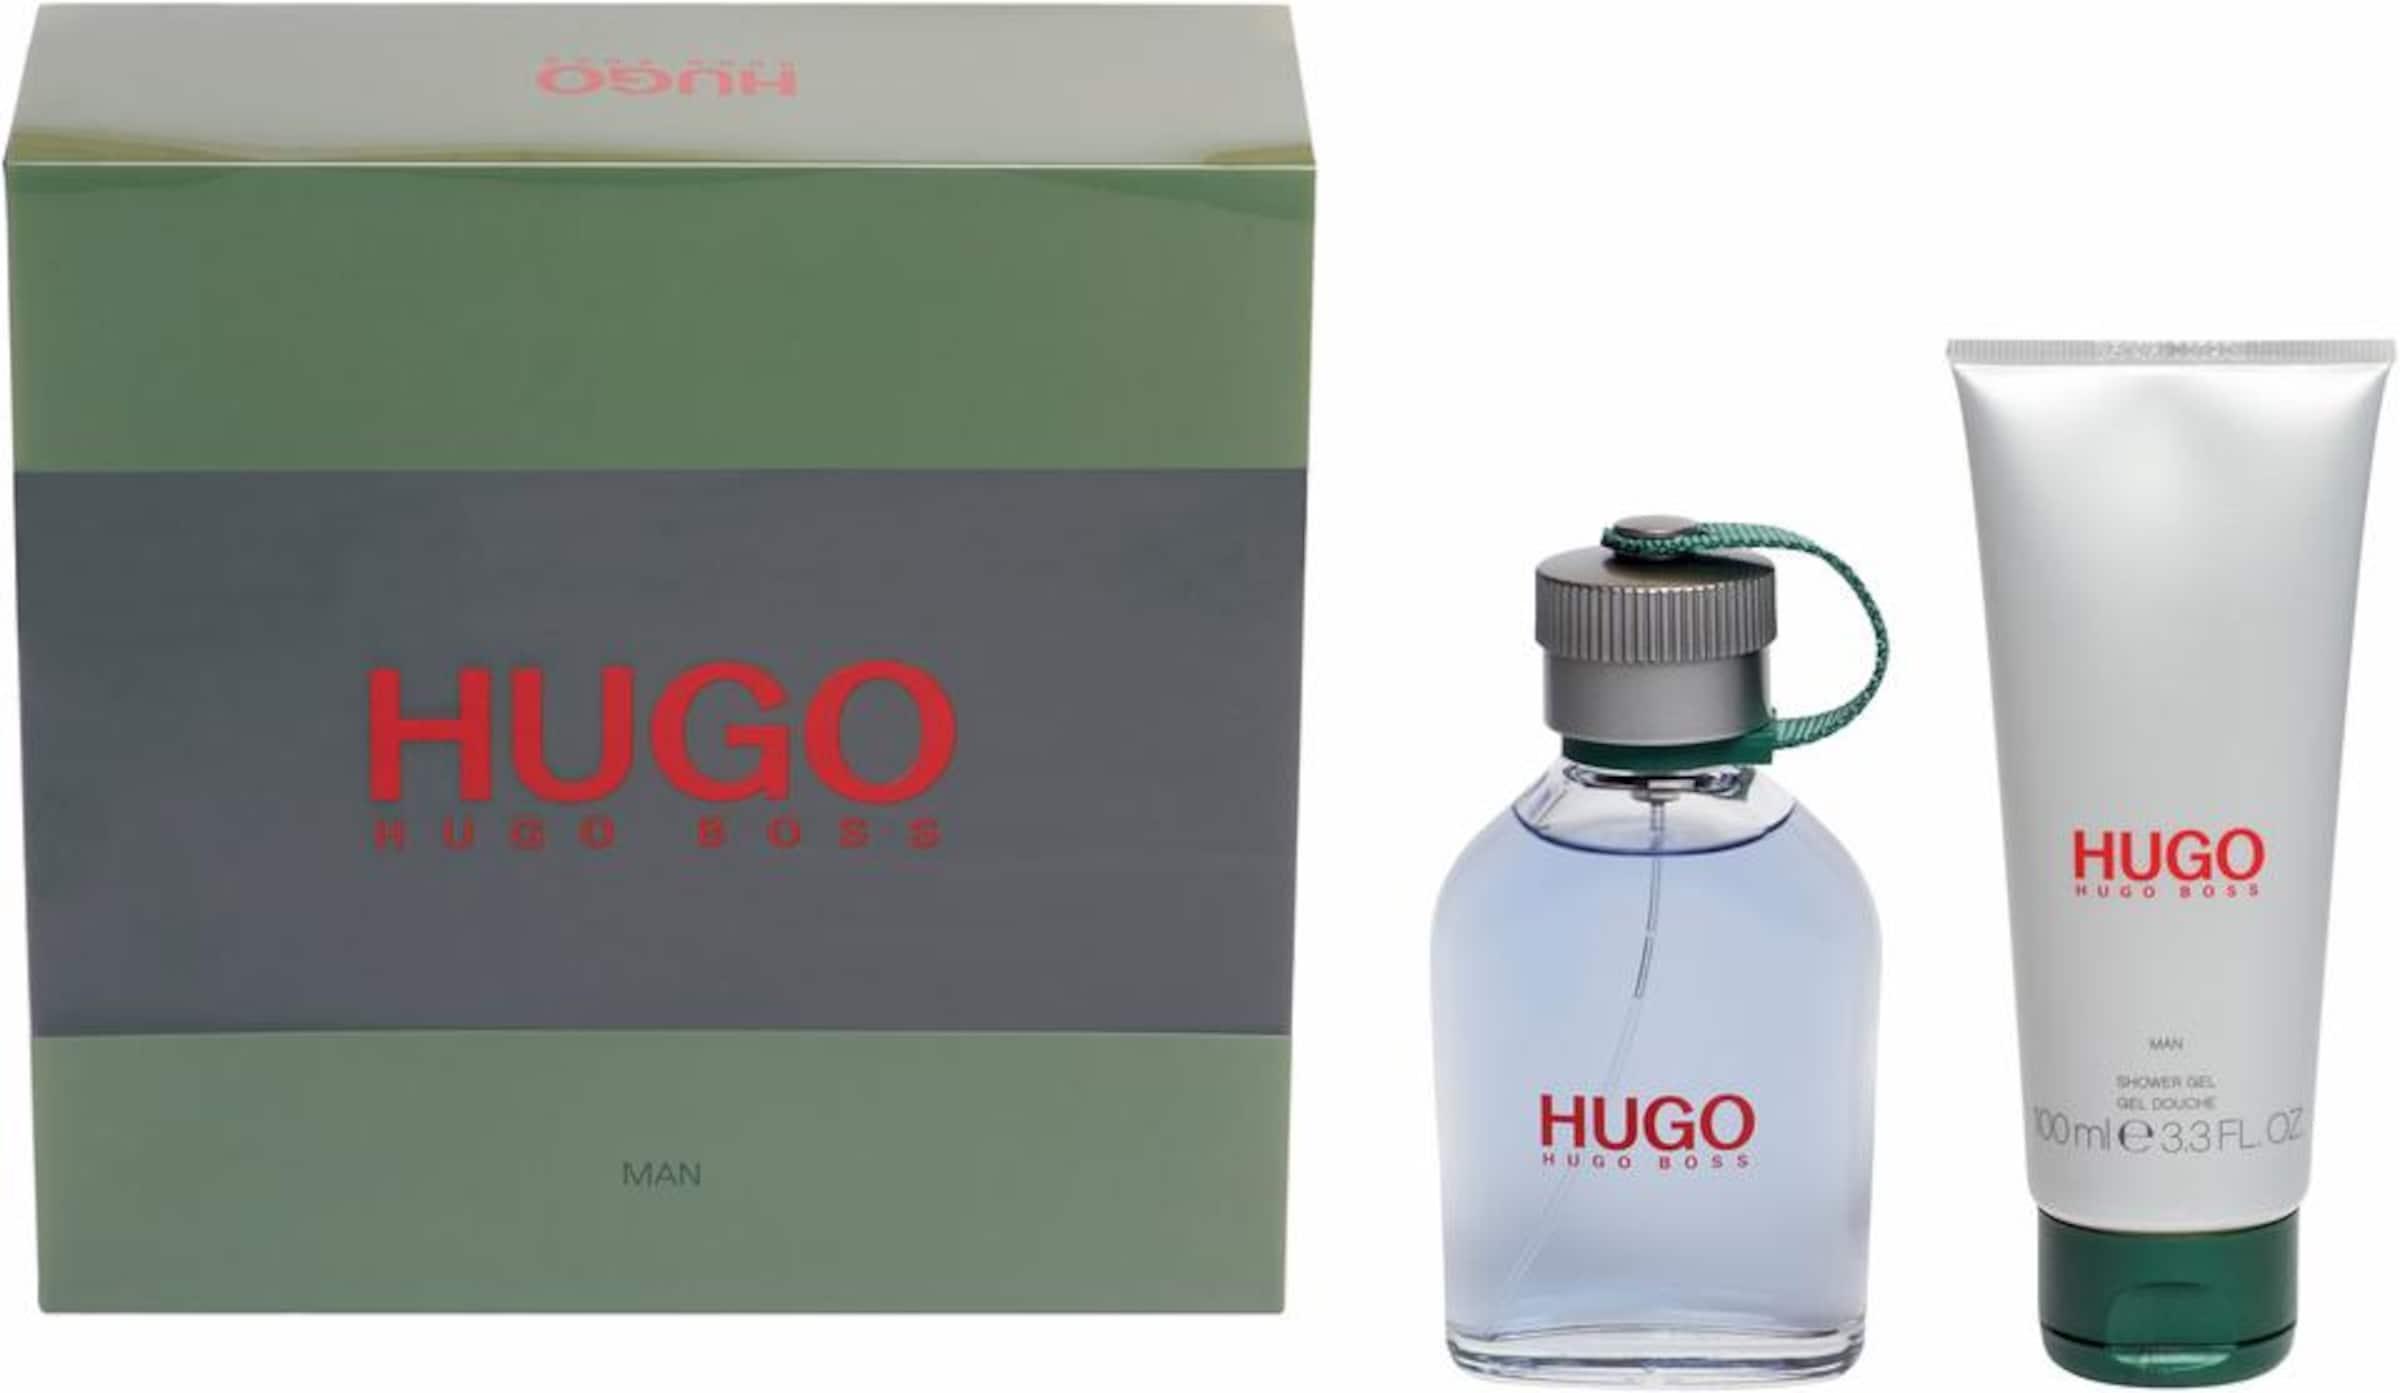 Hugo Duftset2 Grün Hugo HellblauSilbergrau TlgIn Duftset2 TlgIn dhtsQrC